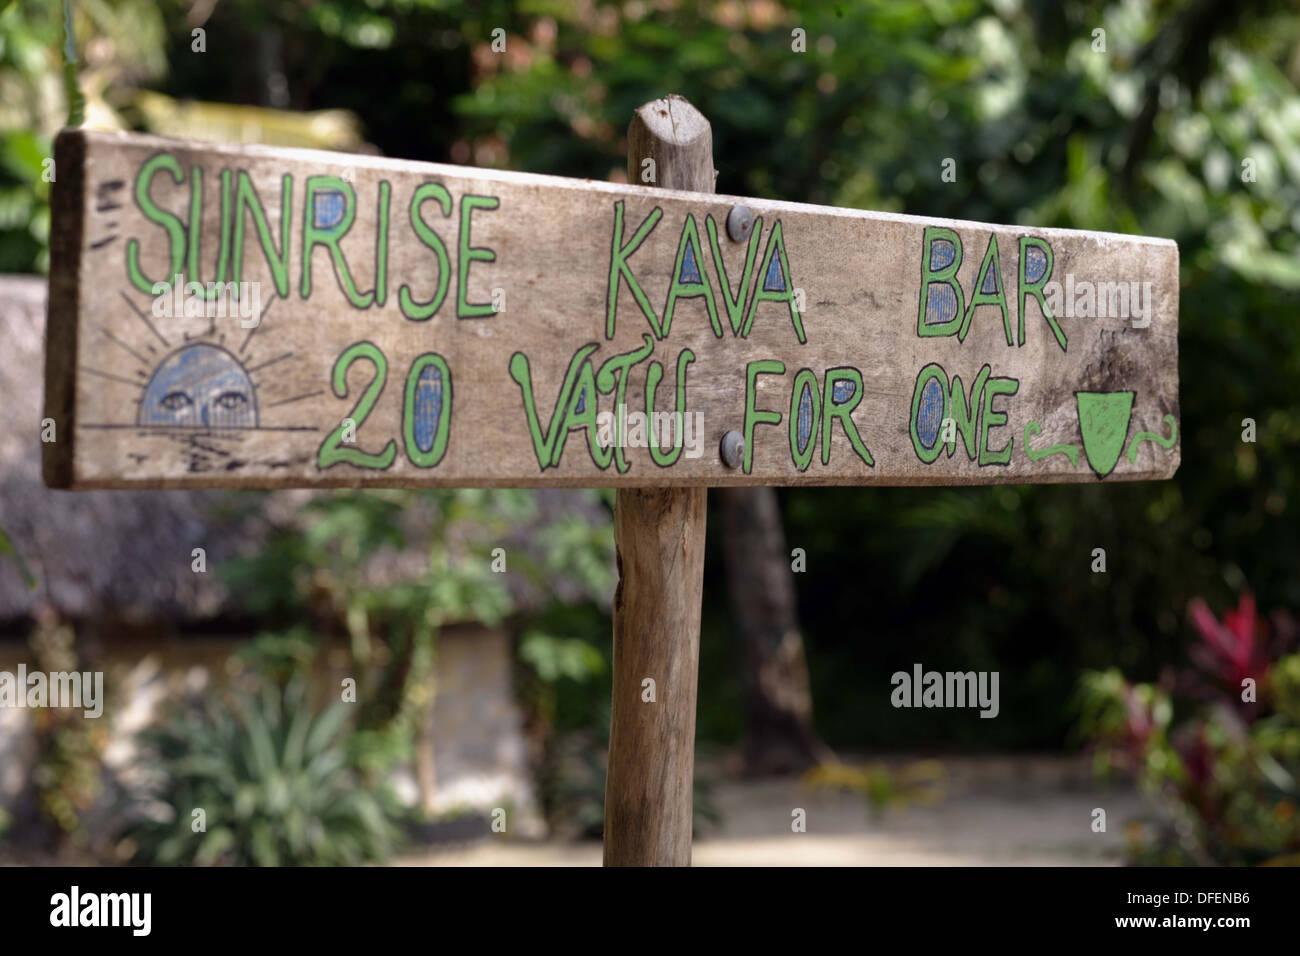 Roadside sign for a Kava bar, Vanua Lava, Banks, Vanuatu, Melanesia, South Pacific - Stock Image